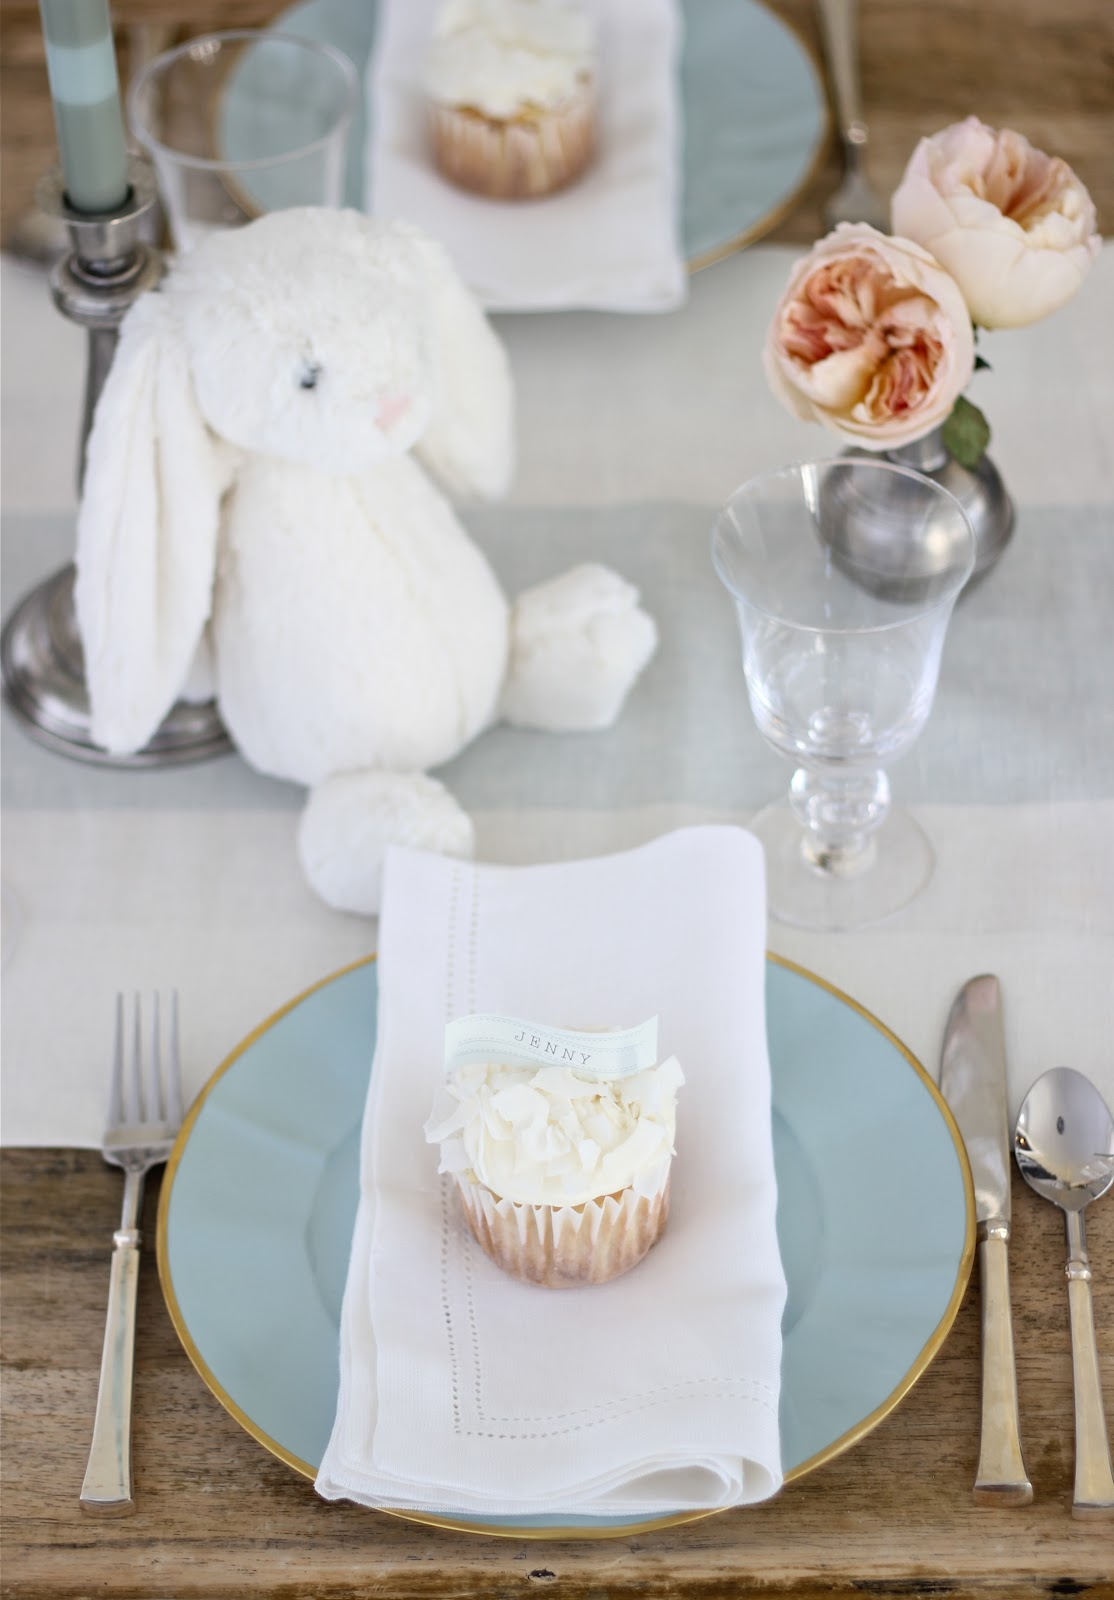 jenny steffens hobick bunny baby shower table setting menu